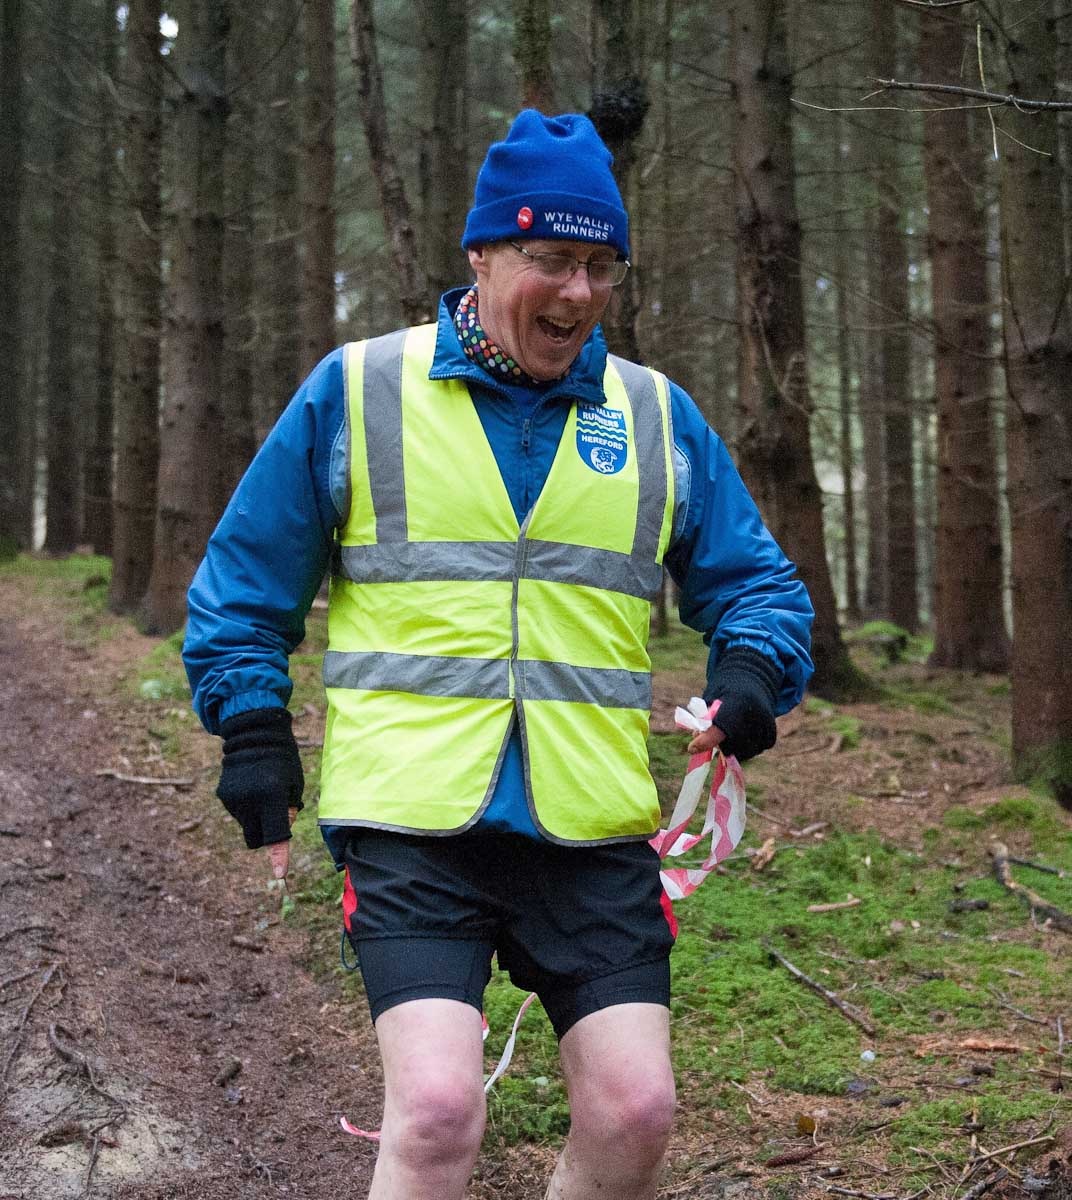 Wye Vally Runners-29.jpg